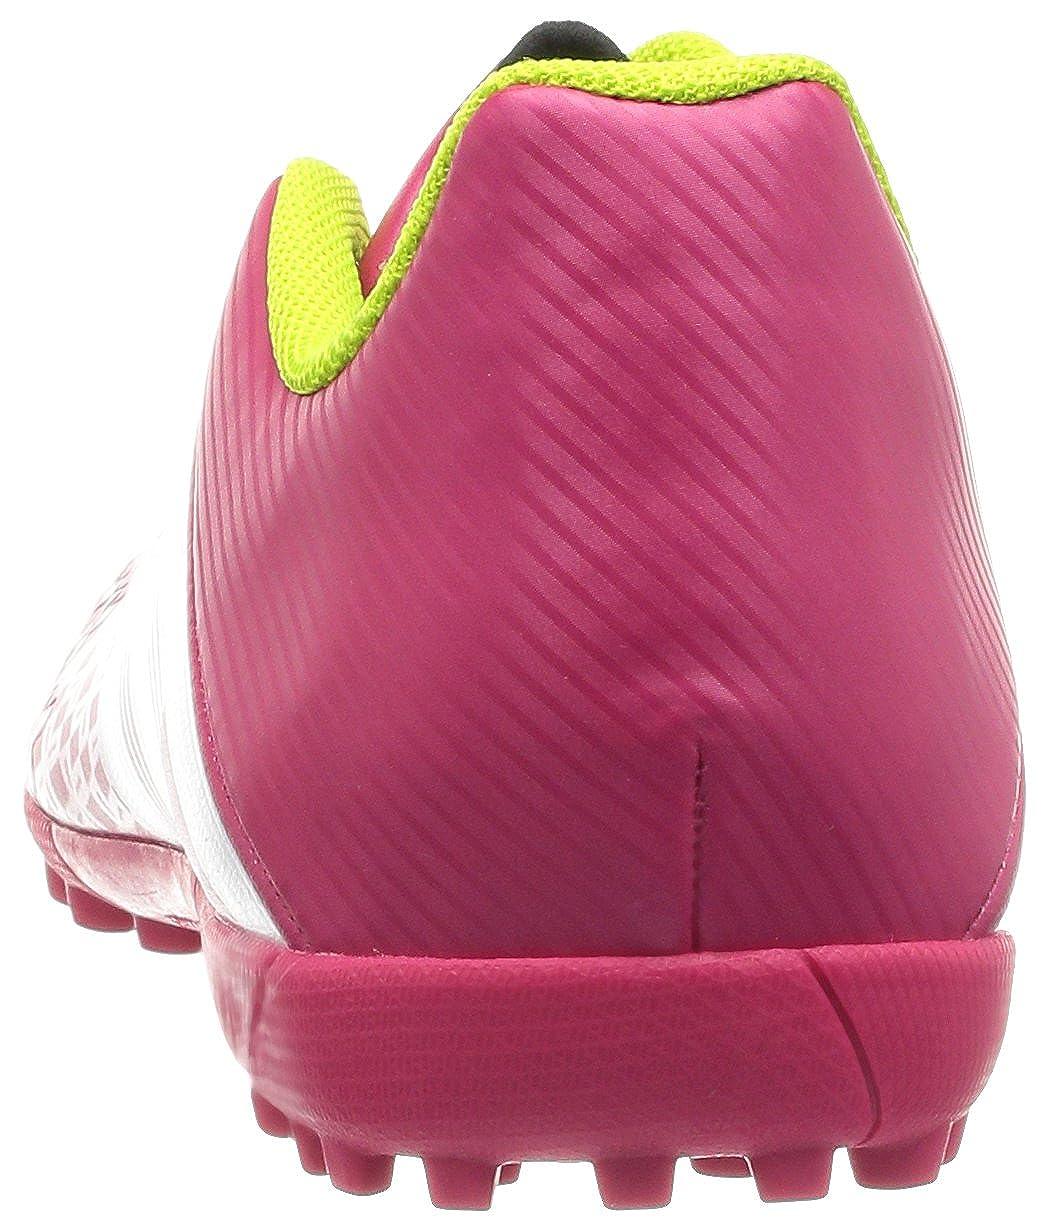 Adidas Adidas Adidas Performance Predito LZ TRX TF, Scarpe da corsa Unisex 148553